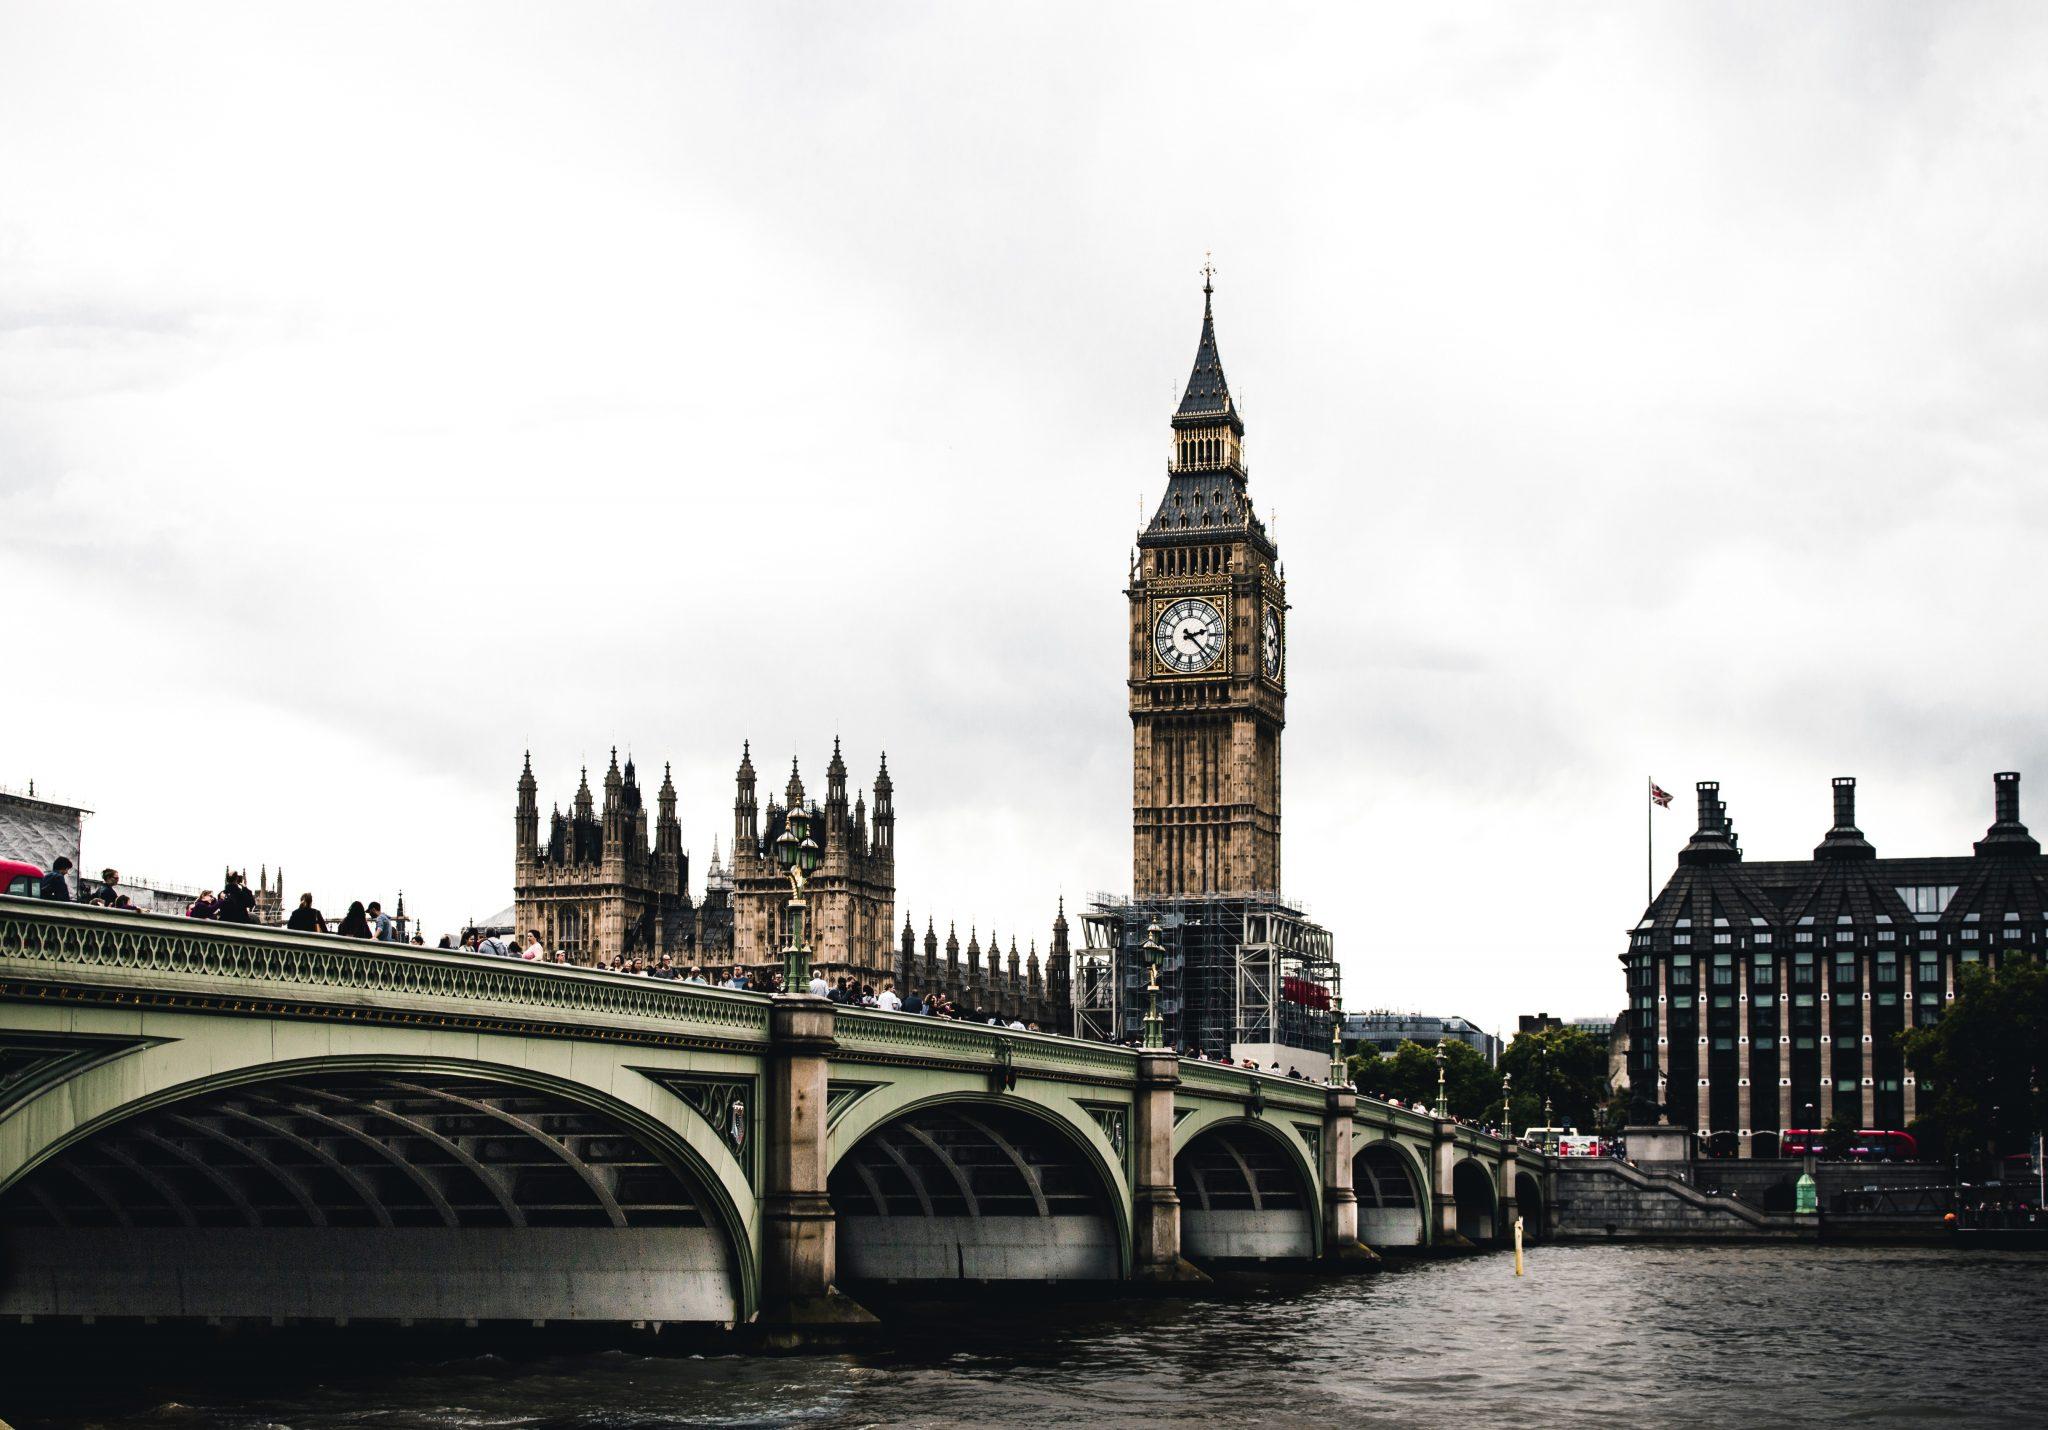 UK parliament and big ben